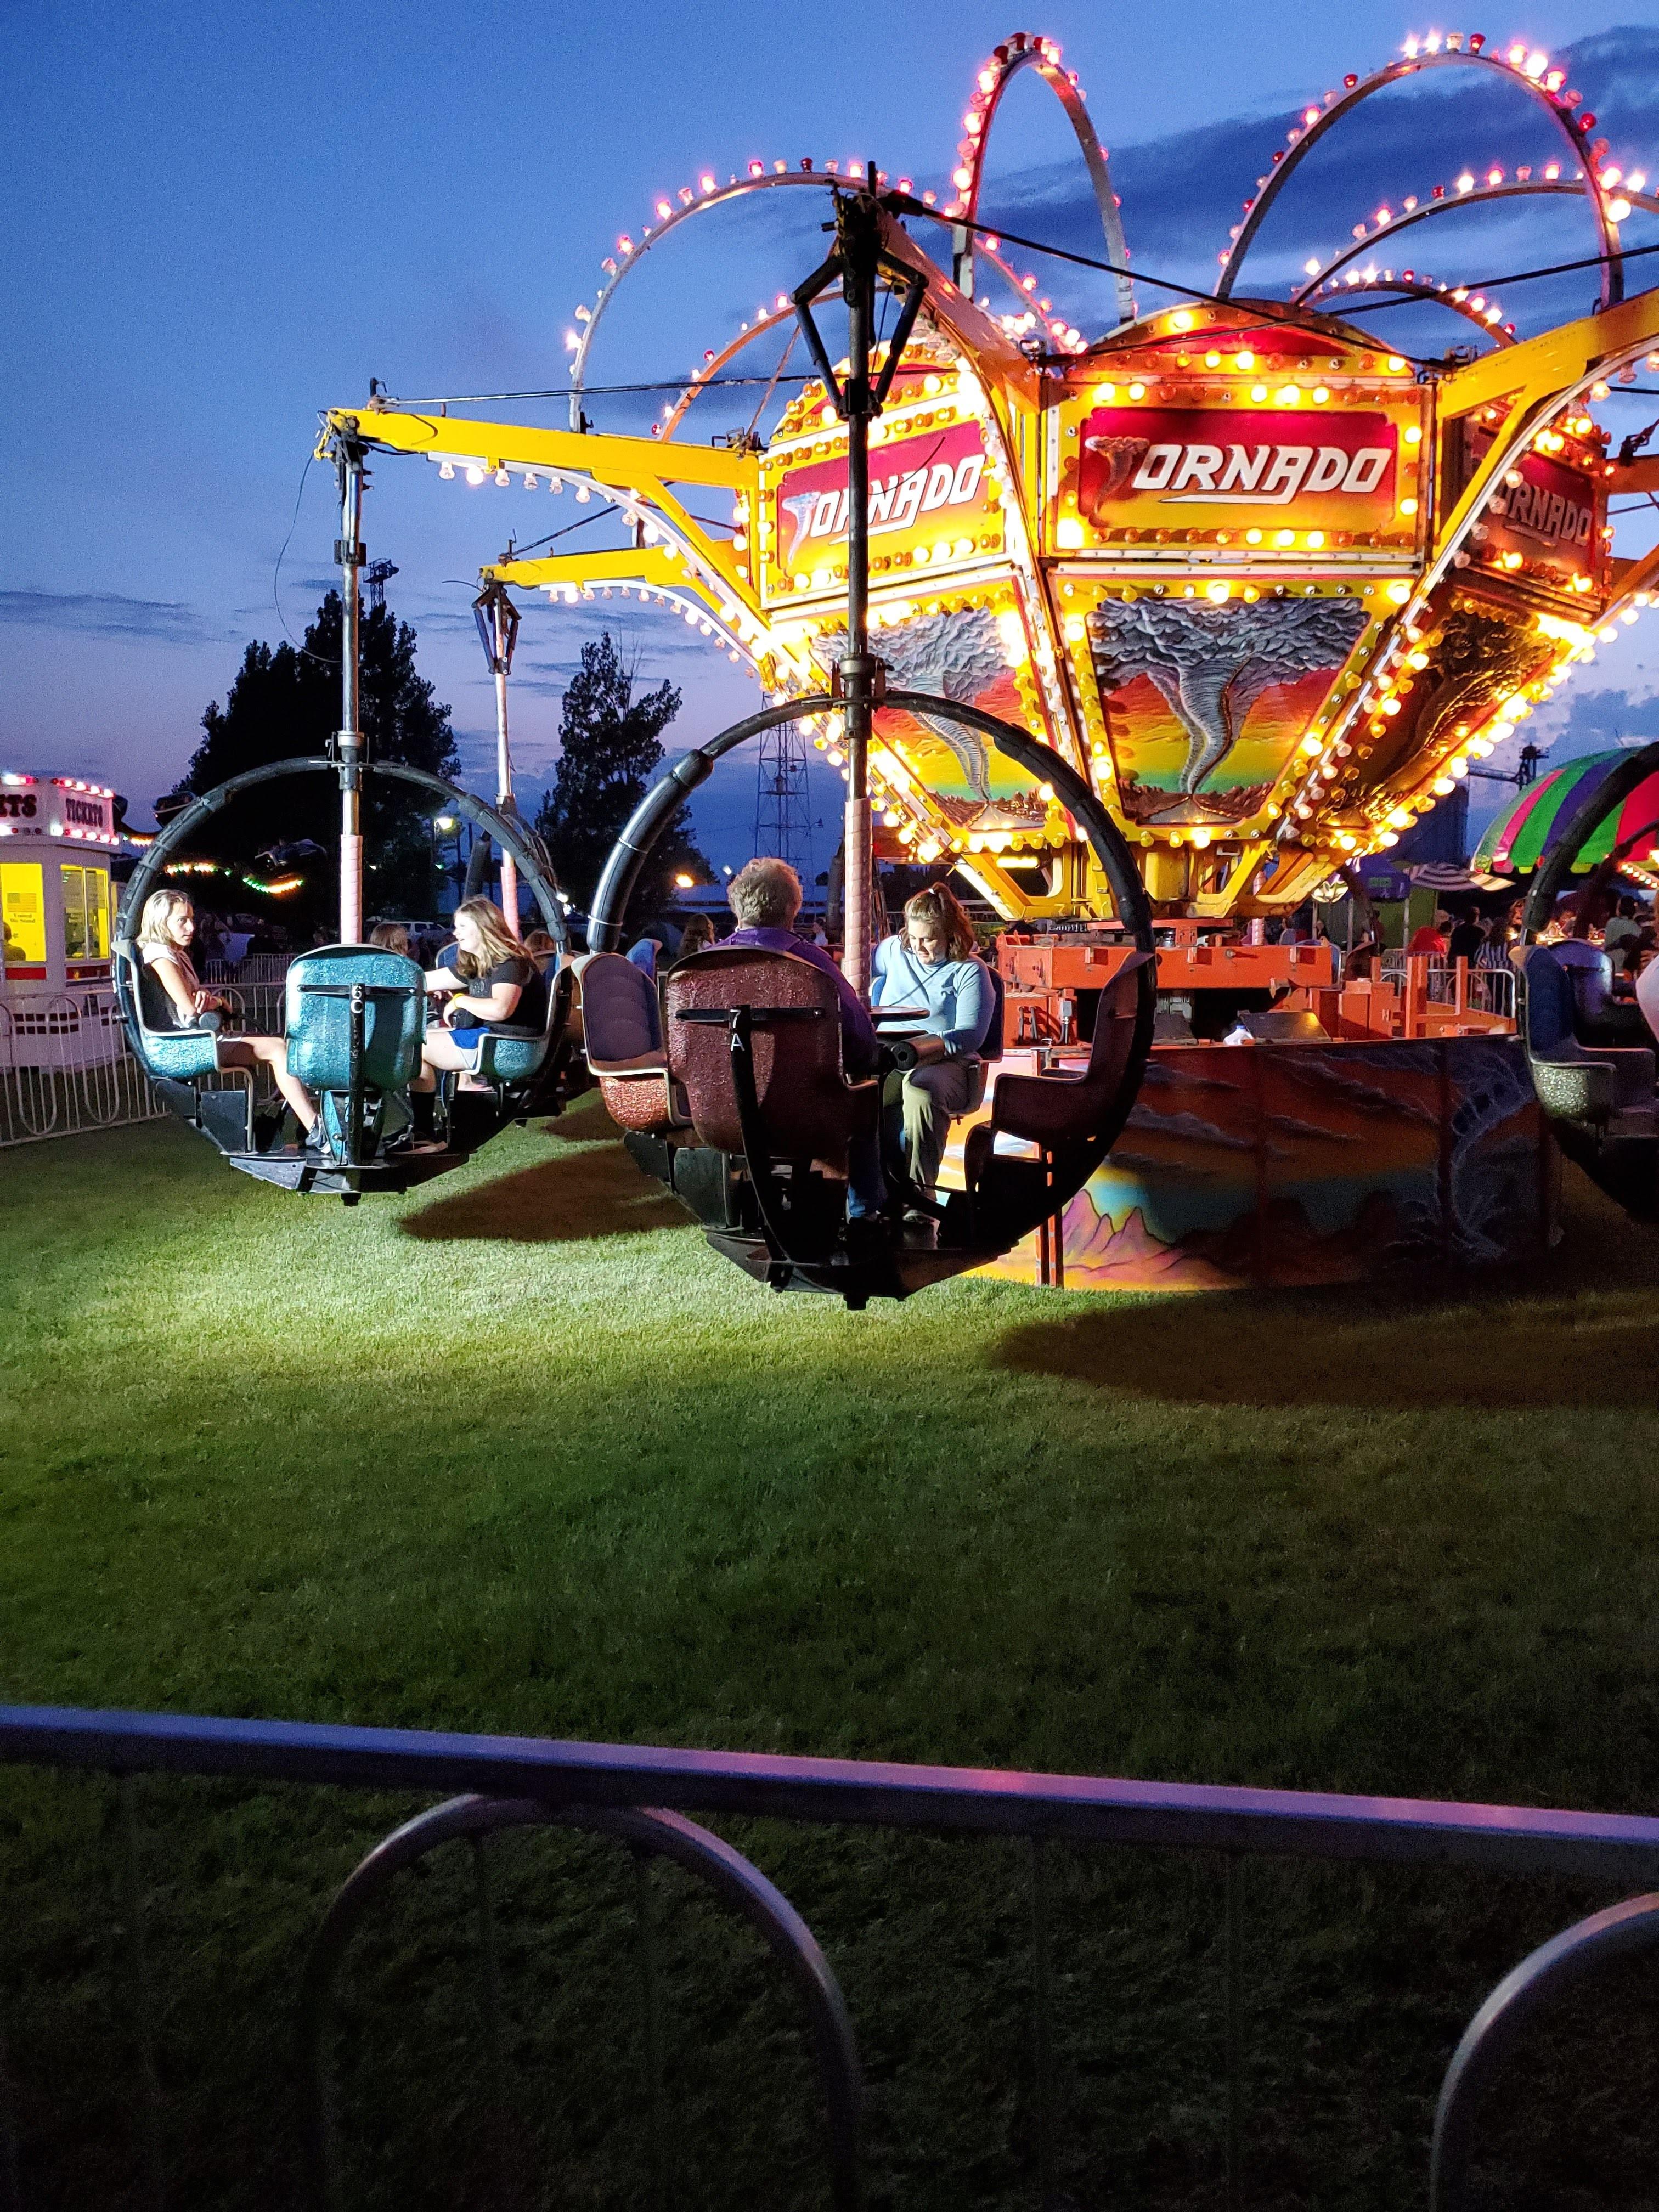 EOT County Fair Otter Tail County Fair in Minnesota